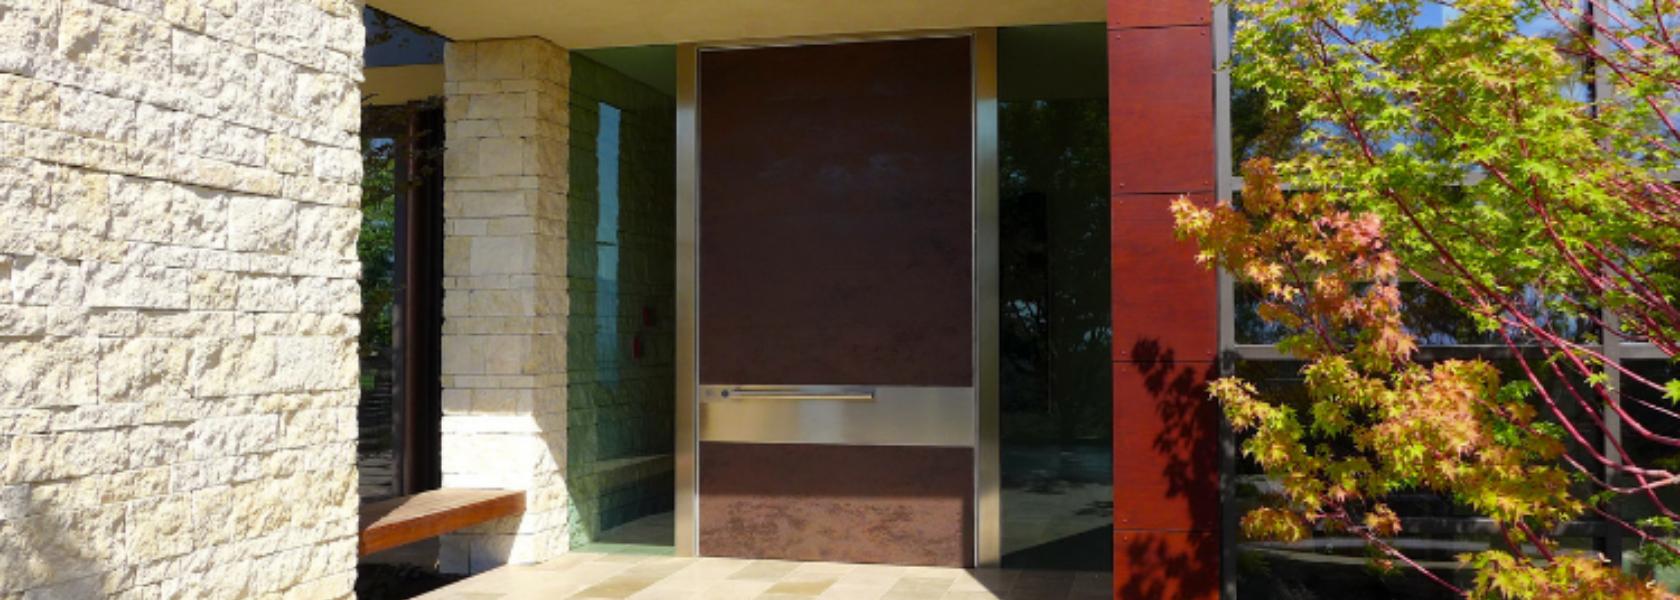 Designing entrances: natural light - Oikos